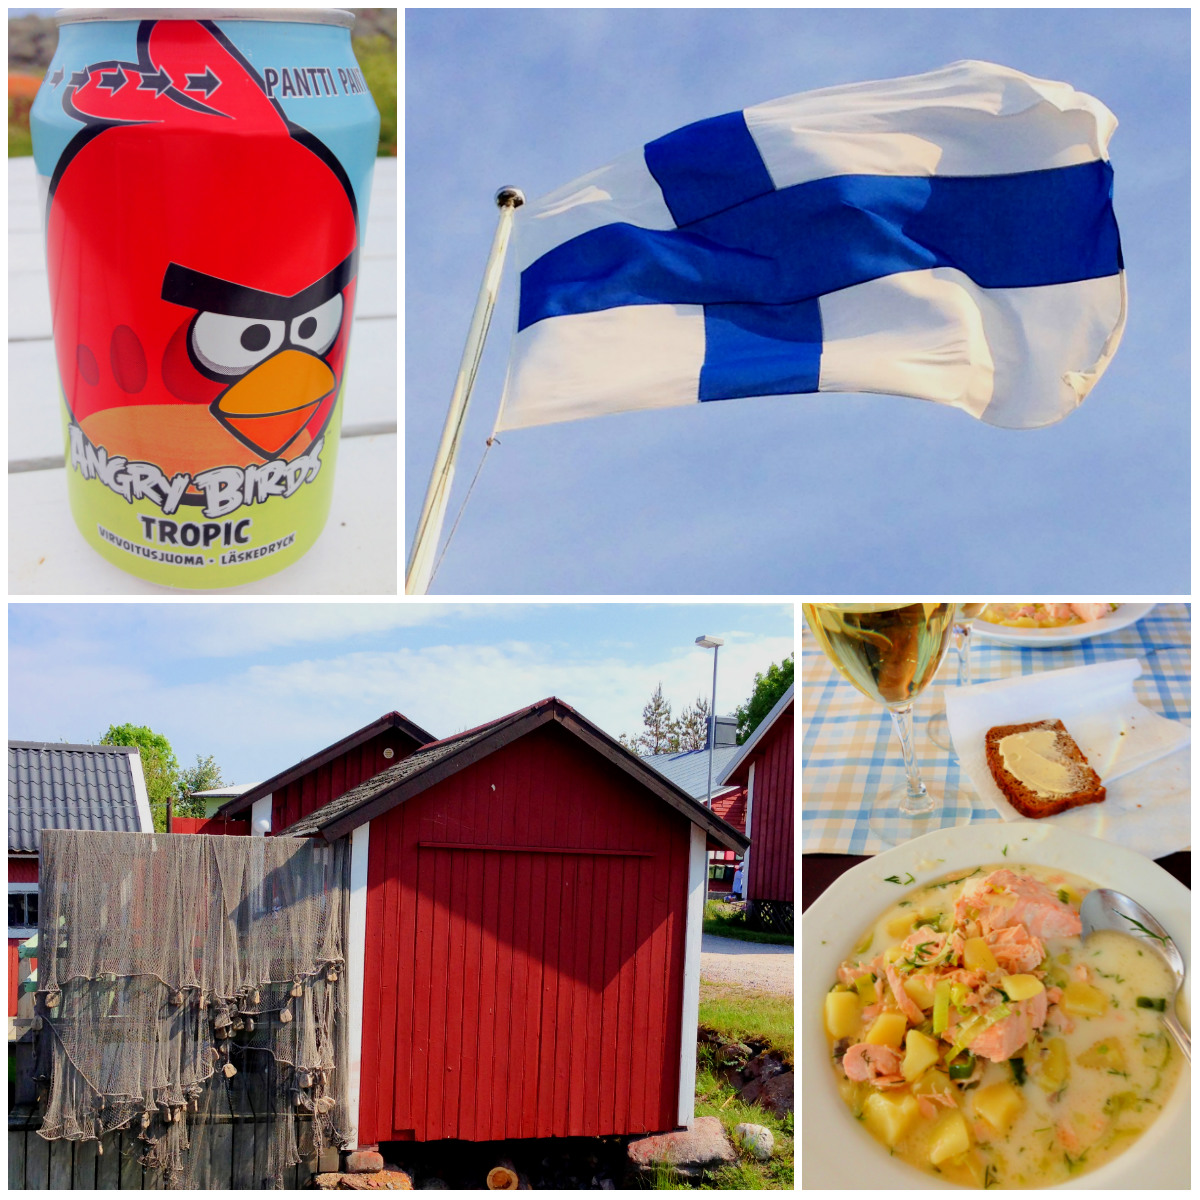 Utoe-Finnland-Essen-Angrybirds